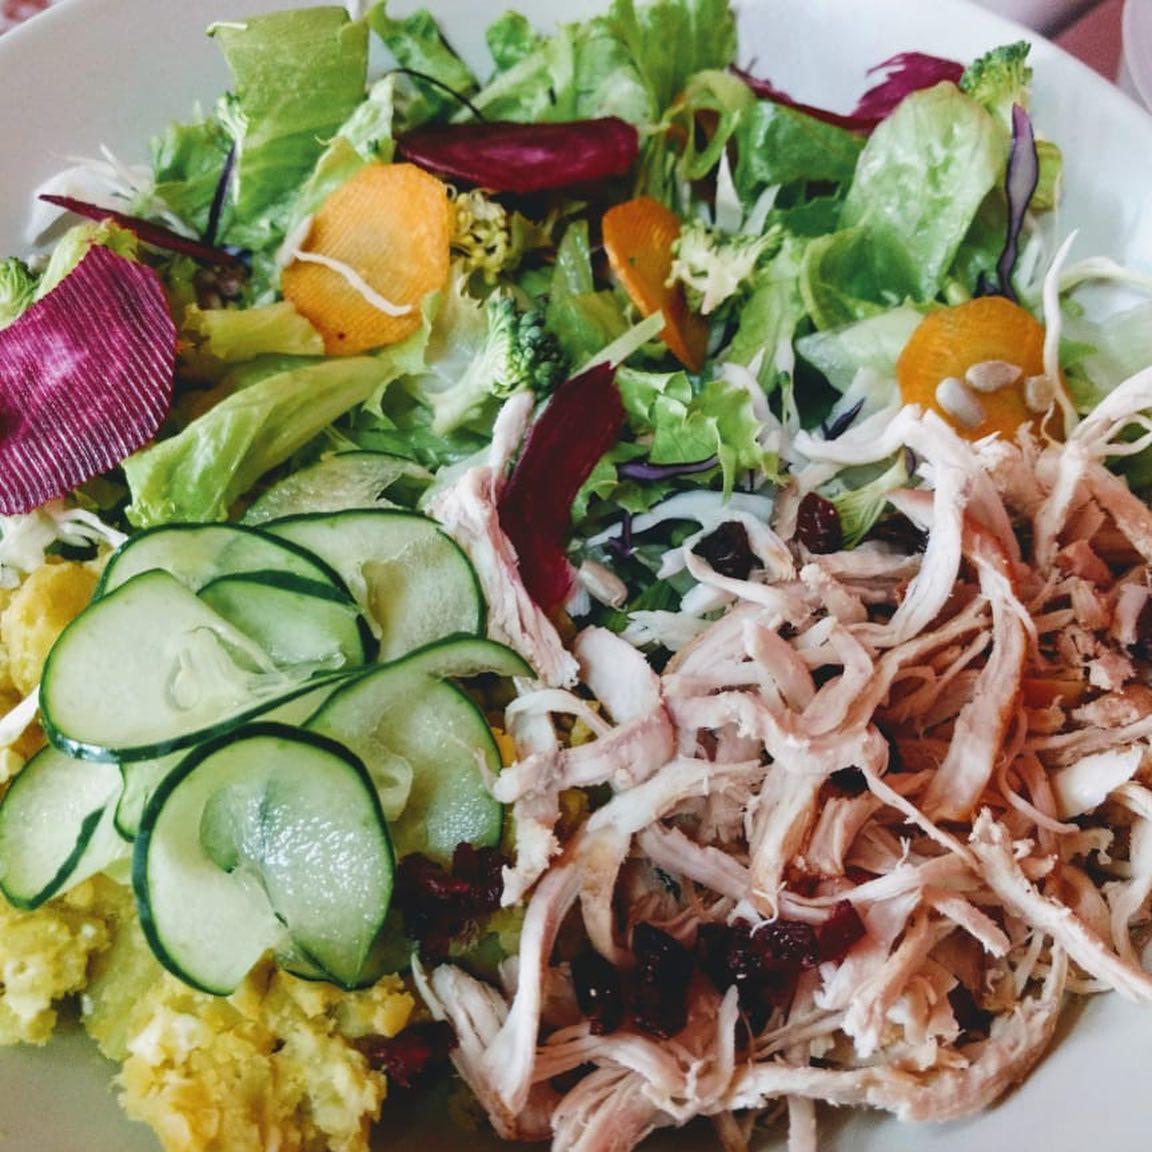 restaurants in ocho rios 2400, best restaurants in ocho rios 170, ocho rios food, where to eat in ocho rios, Eat UR Veggies